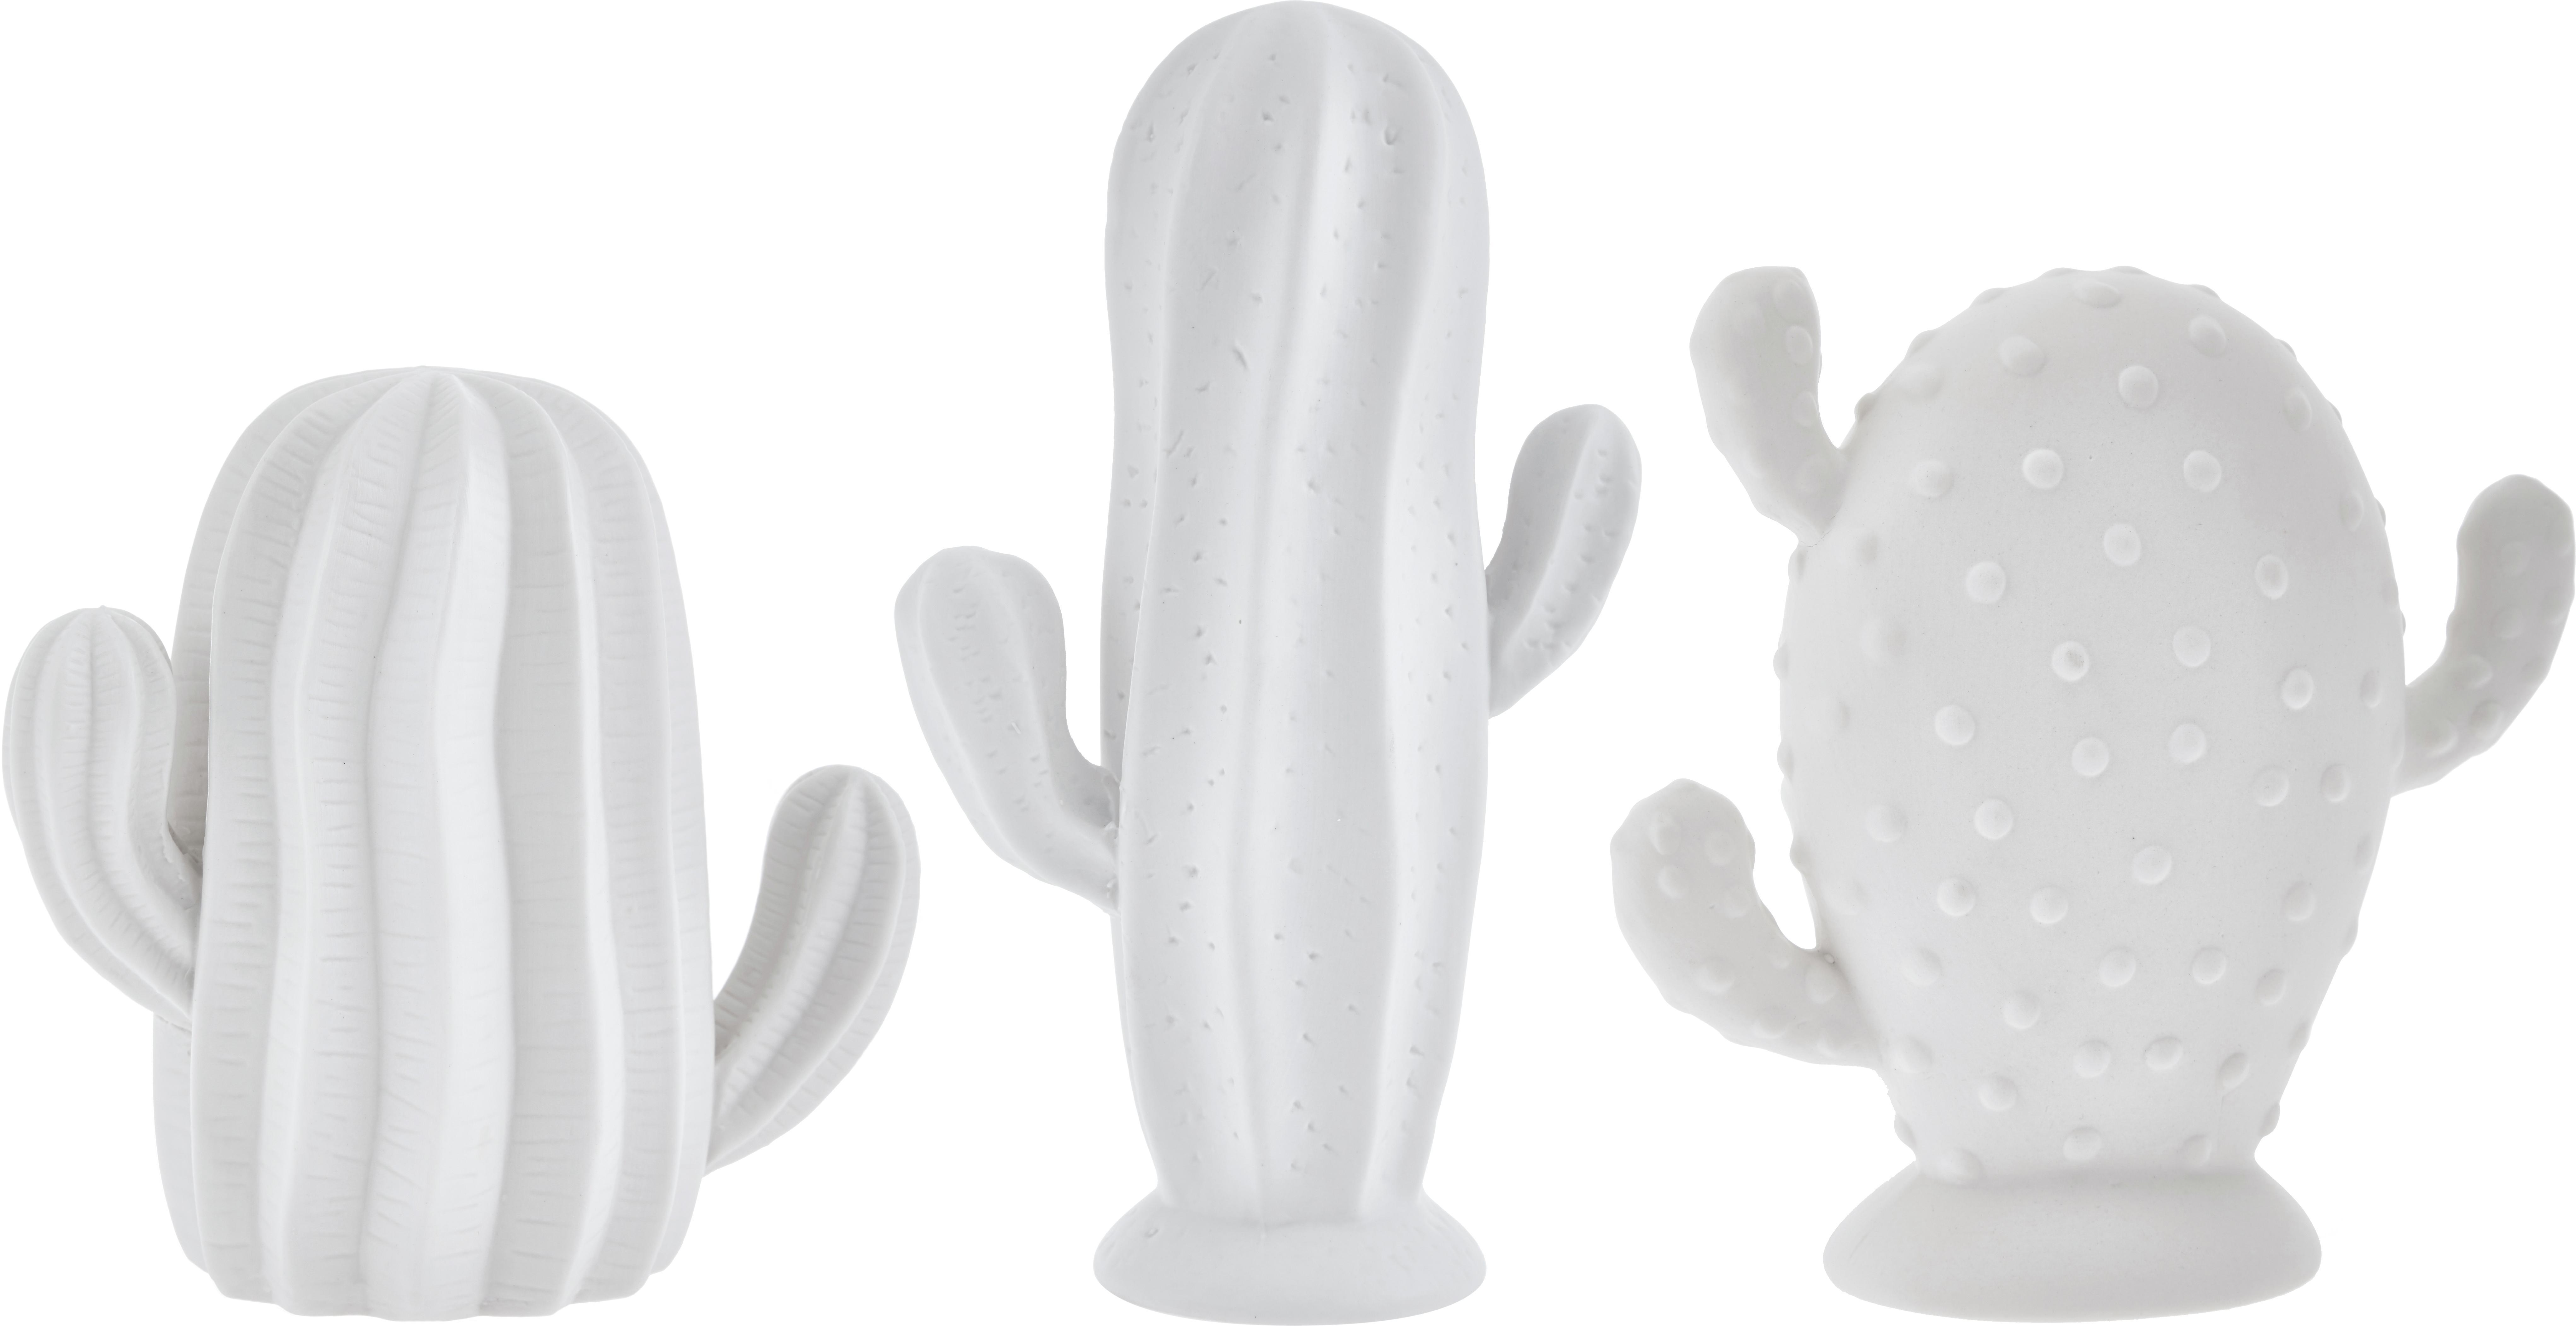 Set cactus da decorazione Dina 3 pz, Porcellana non trattata opaca, Bianco, Diverse dimensioni